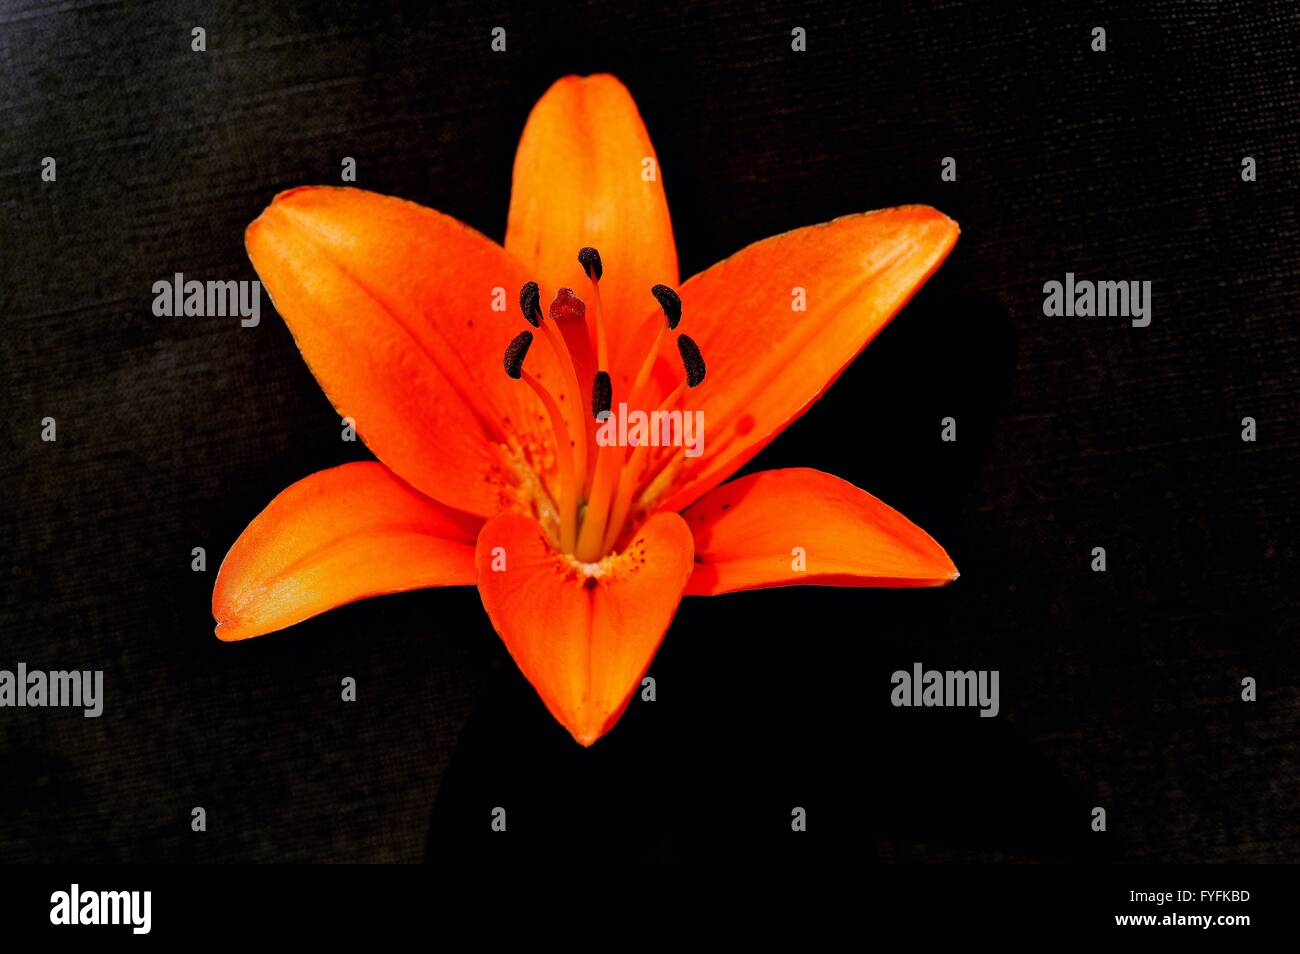 An orange tiger lily flower stock photo 102992049 alamy an orange tiger lily flower izmirmasajfo